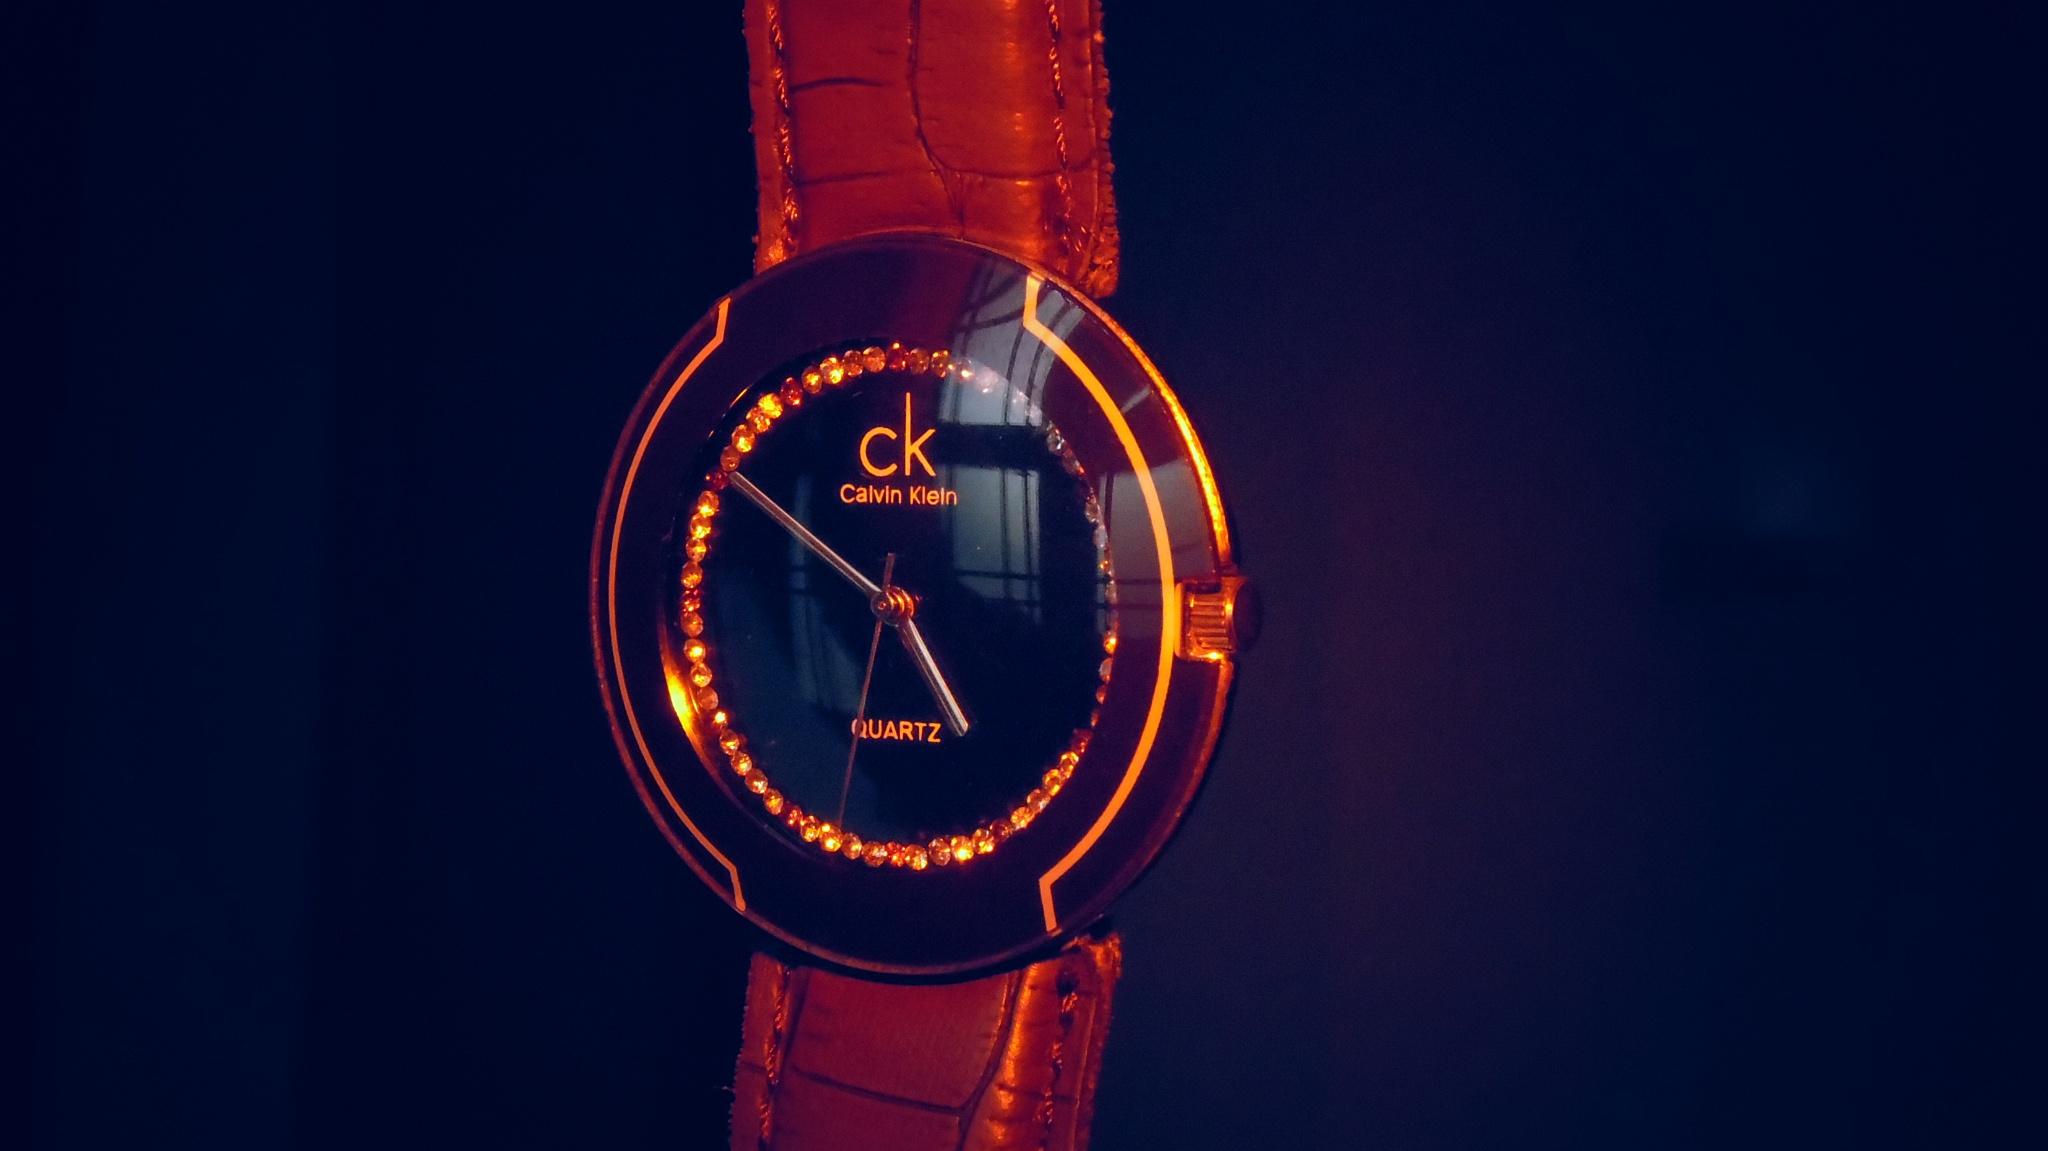 Calvin Klein - Wrist Watch by Photofountain